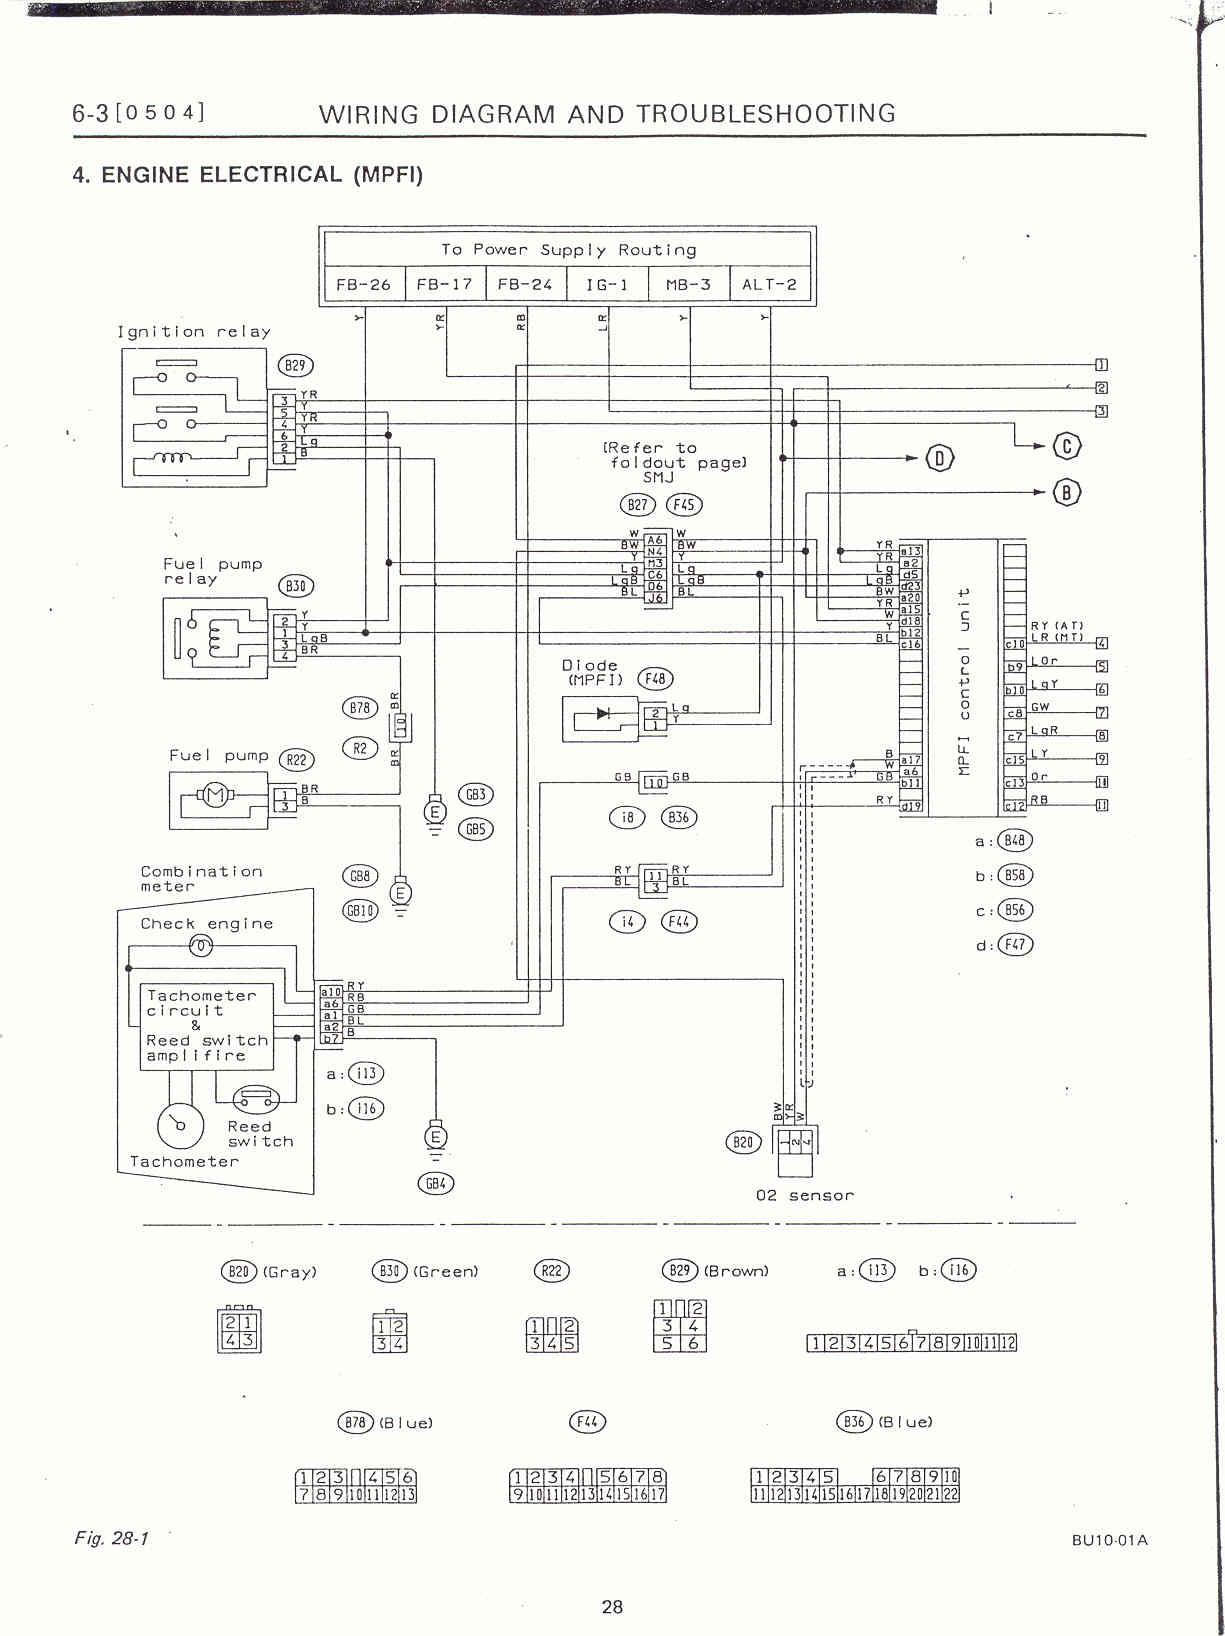 2011 subaru outback headlight wiring diagram subaru wiring schematic wiring diagram e6  subaru wiring schematic wiring diagram e6